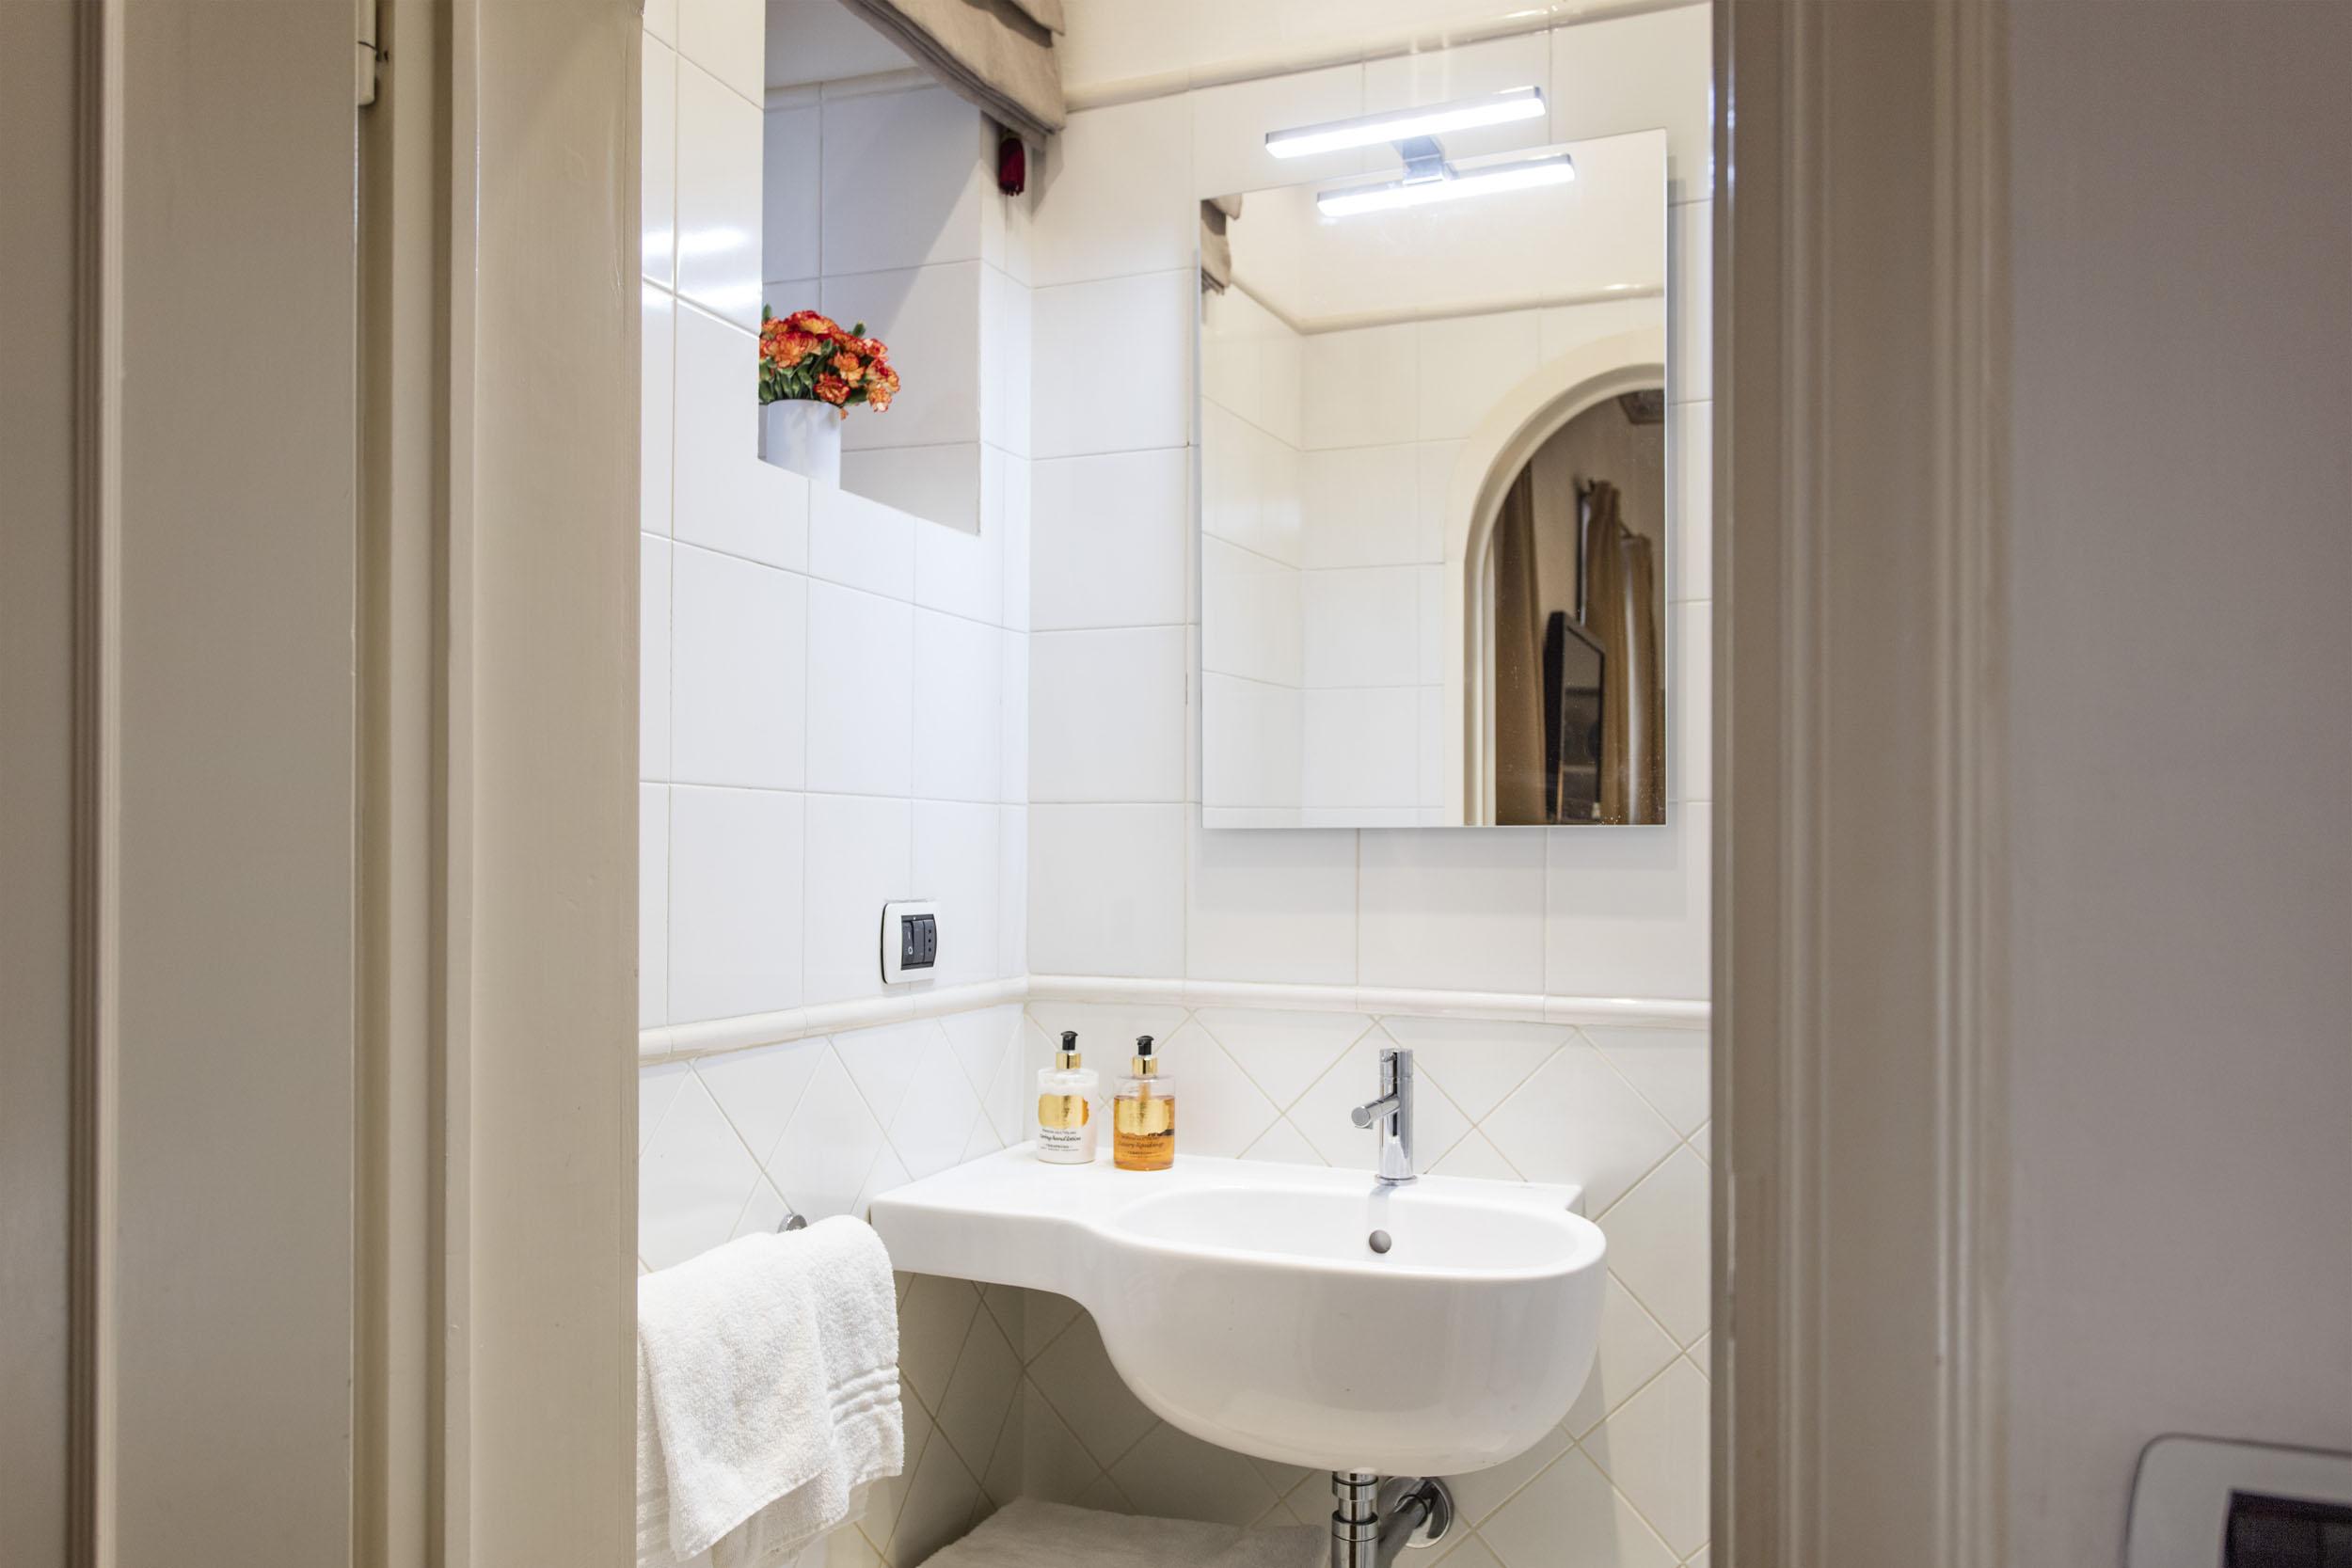 Lilla badrummet